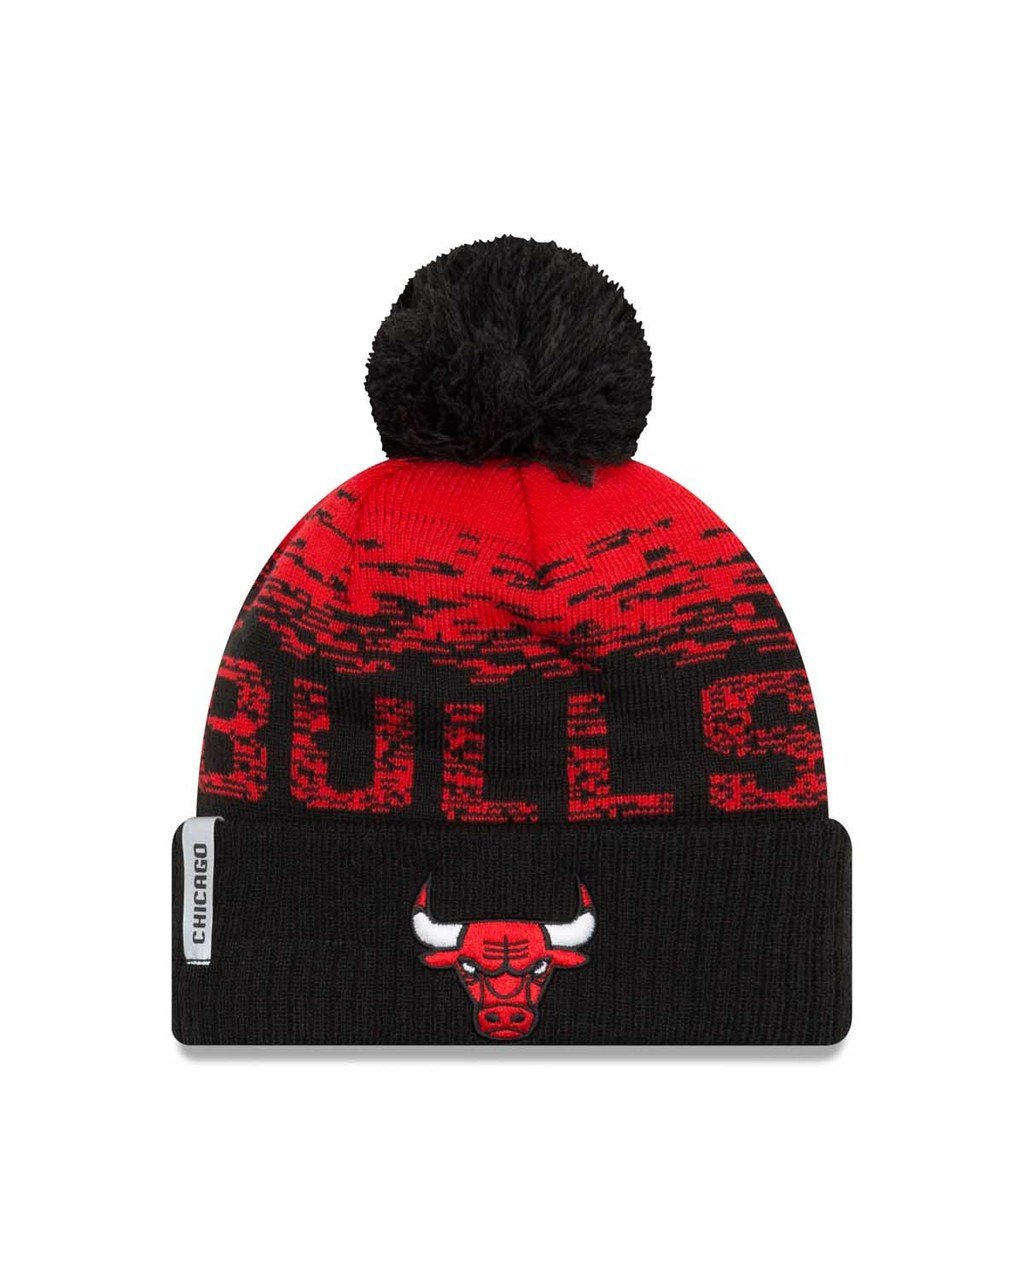 Chicago Bulls New Era NBA ''Sport Knit Flect'' Cuffed Hat with Pom